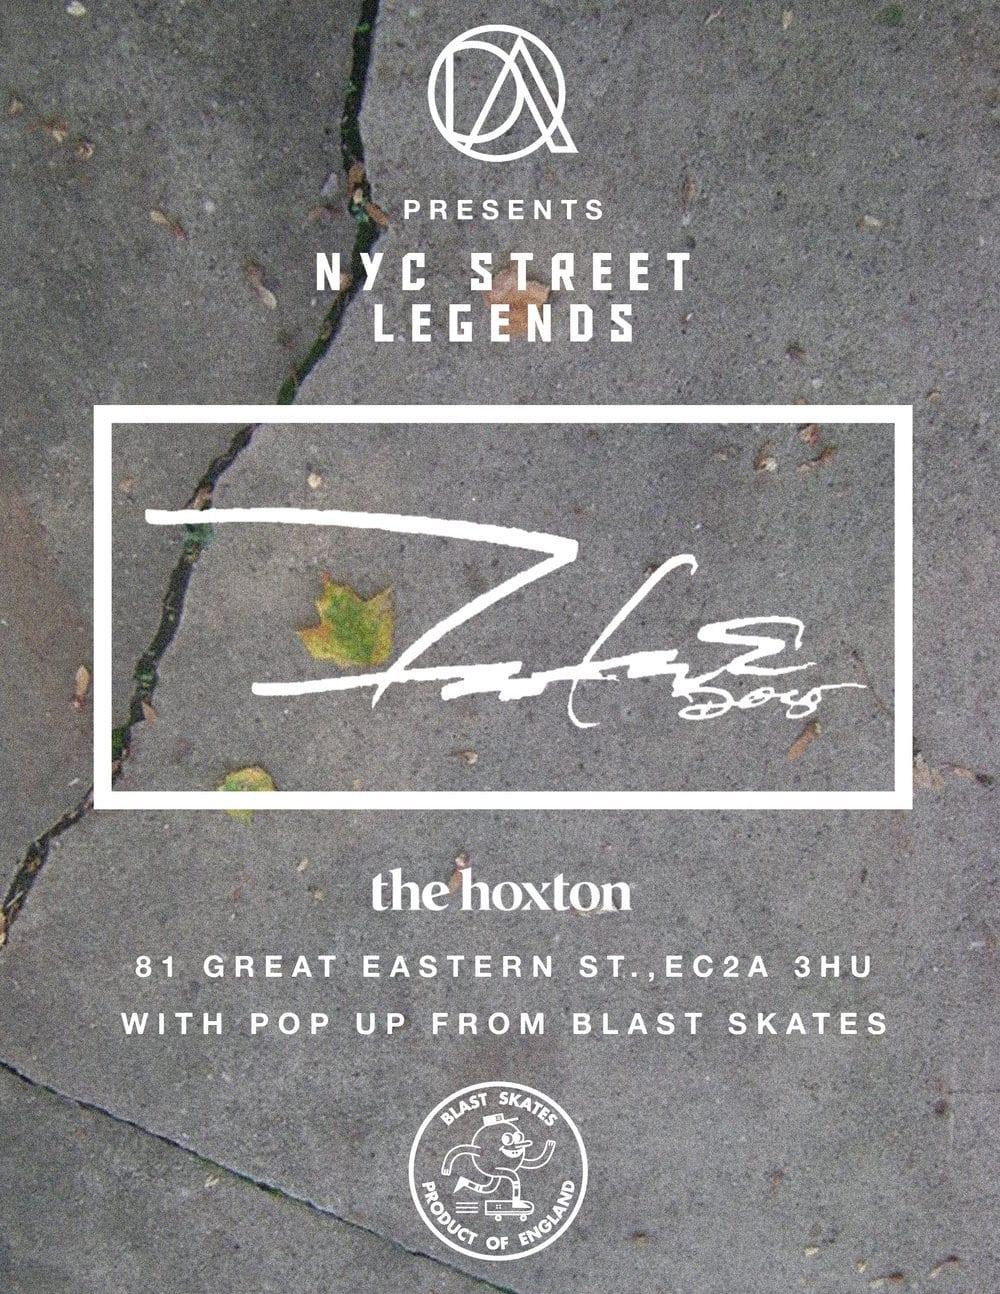 Distassi Art present 'NY Street Legends' at The Hoxton Hotel